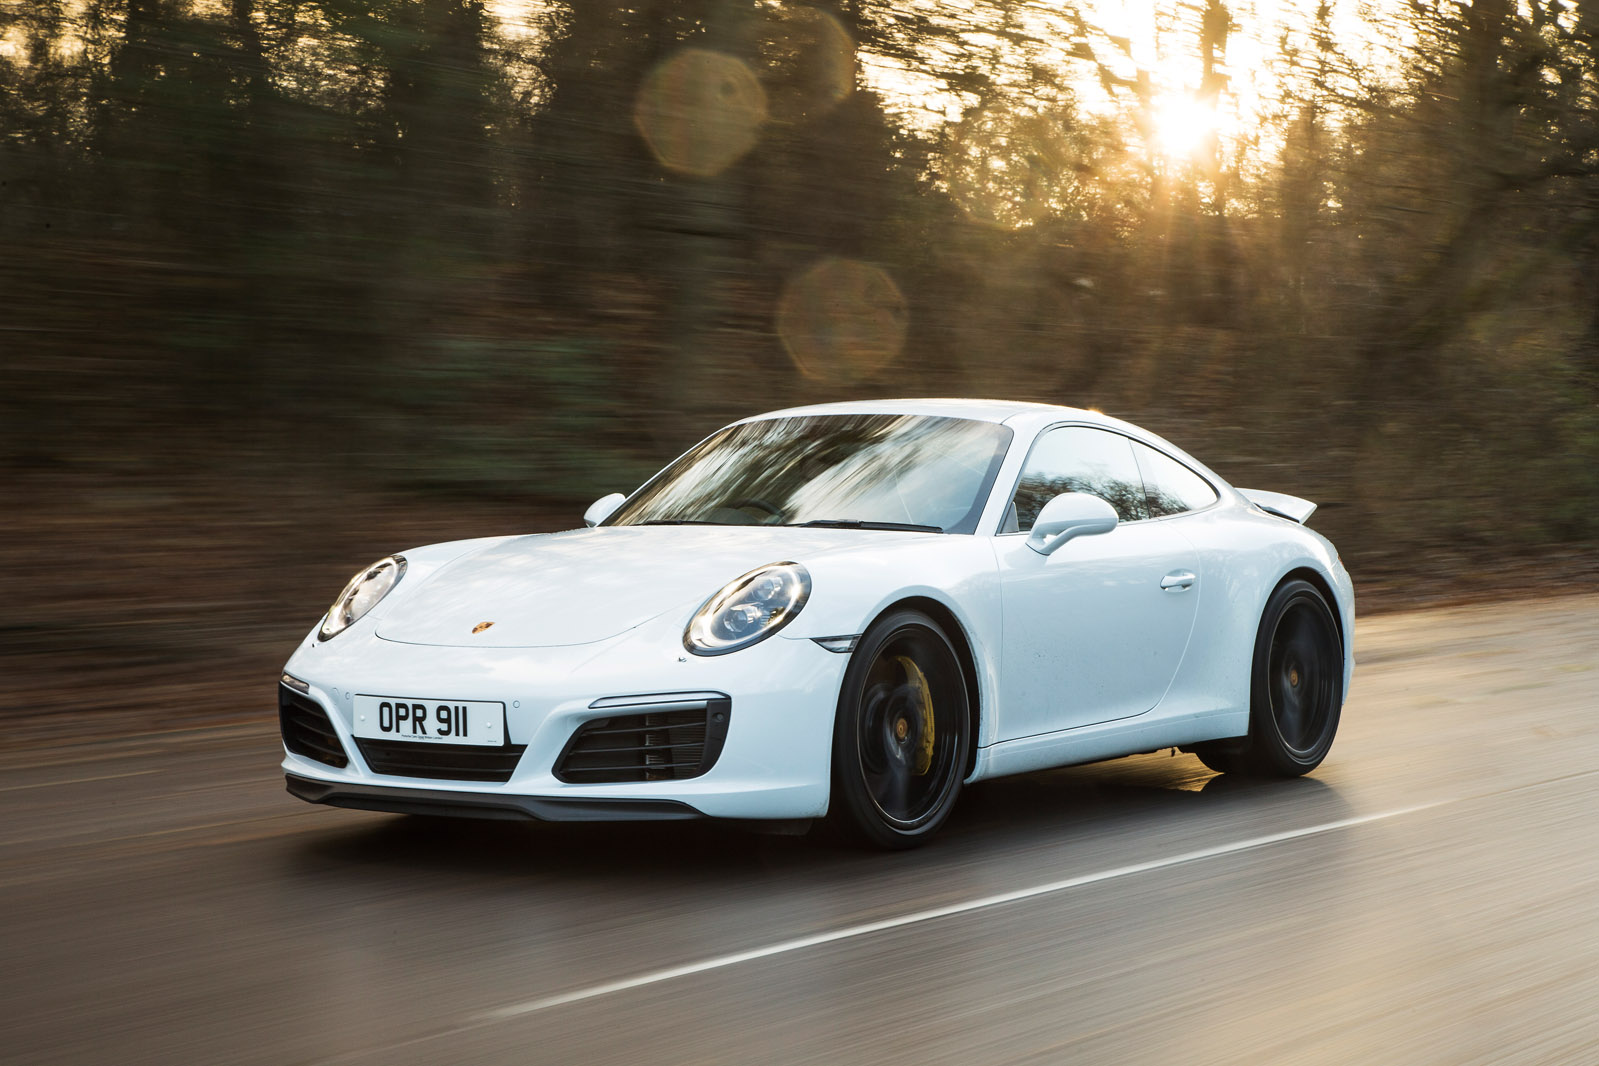 UK CAR MOST AT RISK OF BEING STOLEN: PORSCHE 911 CARRERA 4S